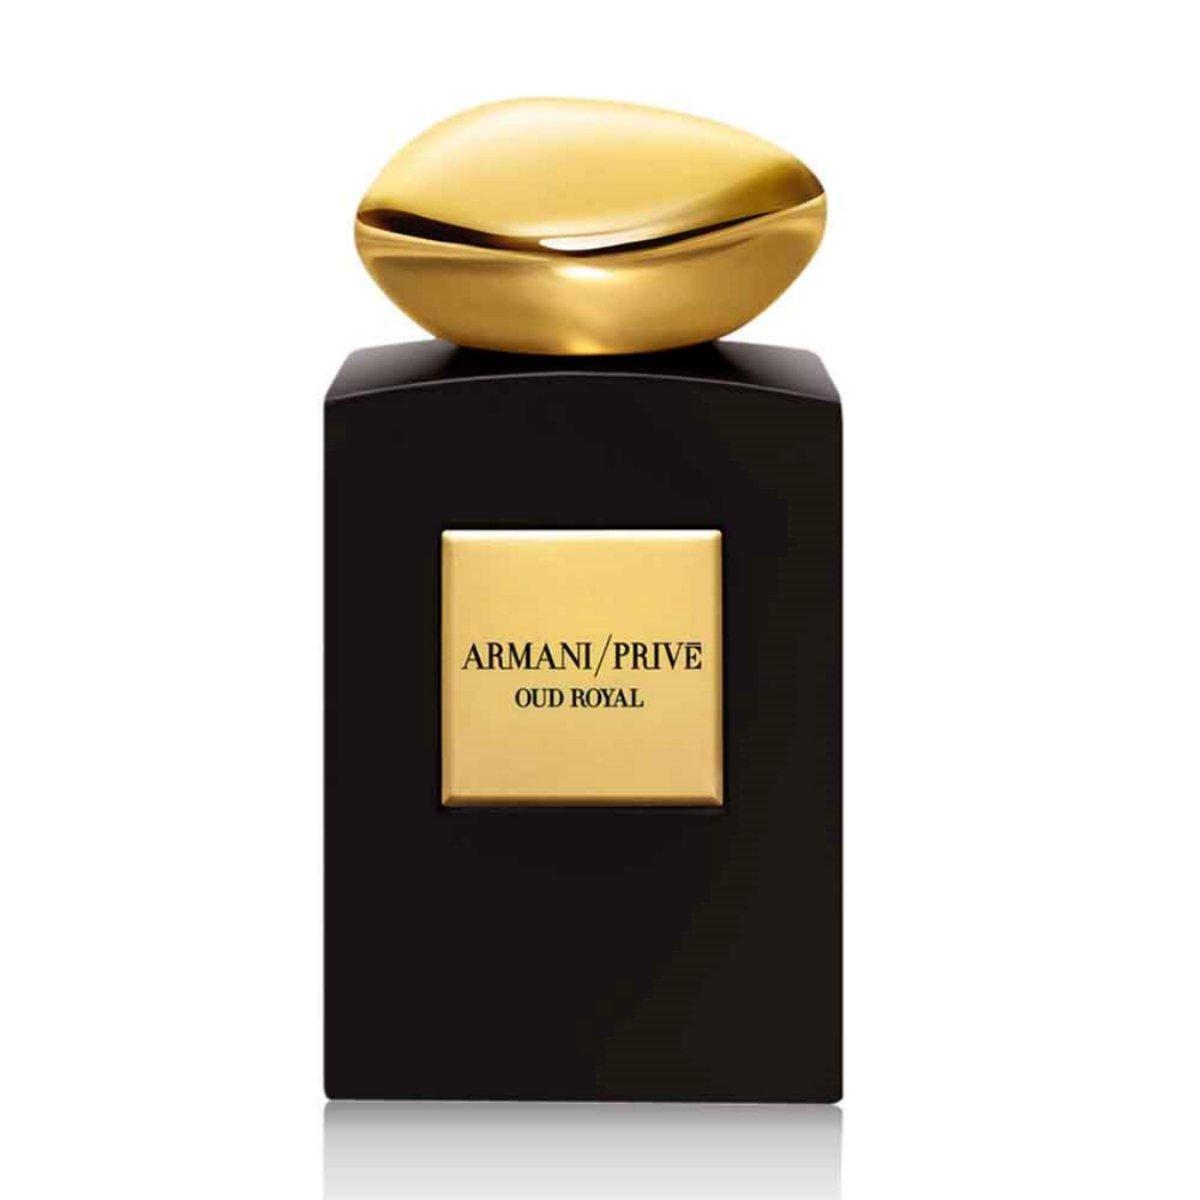 giorgio armani prive oud royal intense eau de parfum 100ml. Black Bedroom Furniture Sets. Home Design Ideas